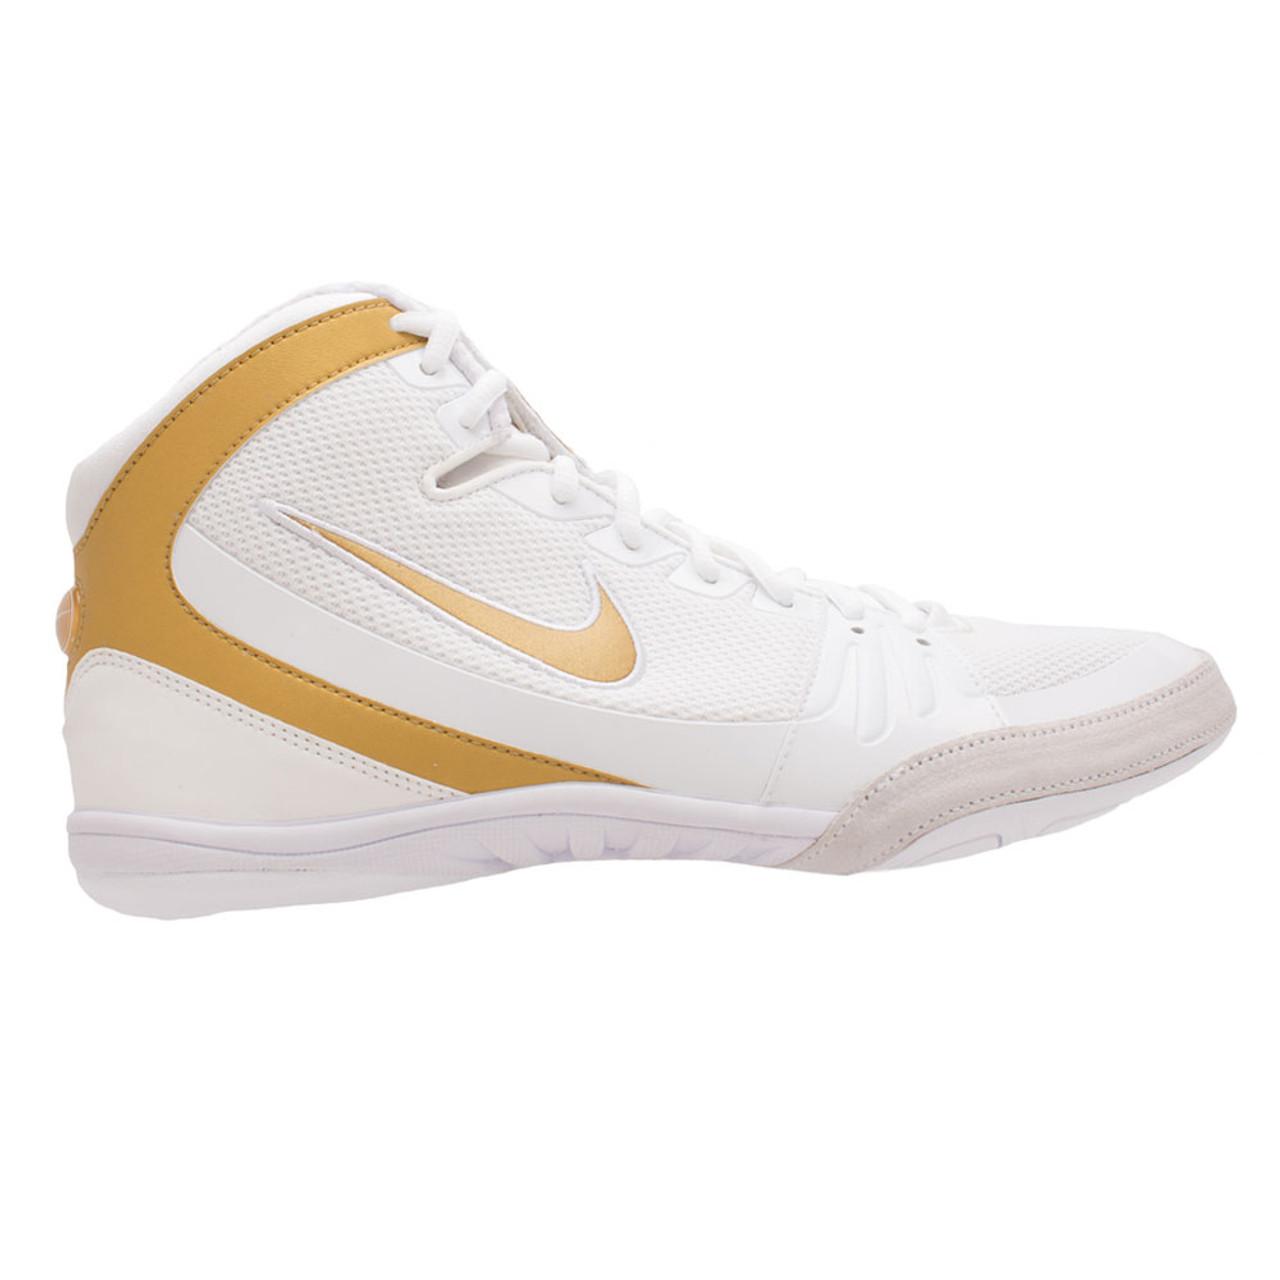 Nike Freek Limited Edition (Multiple